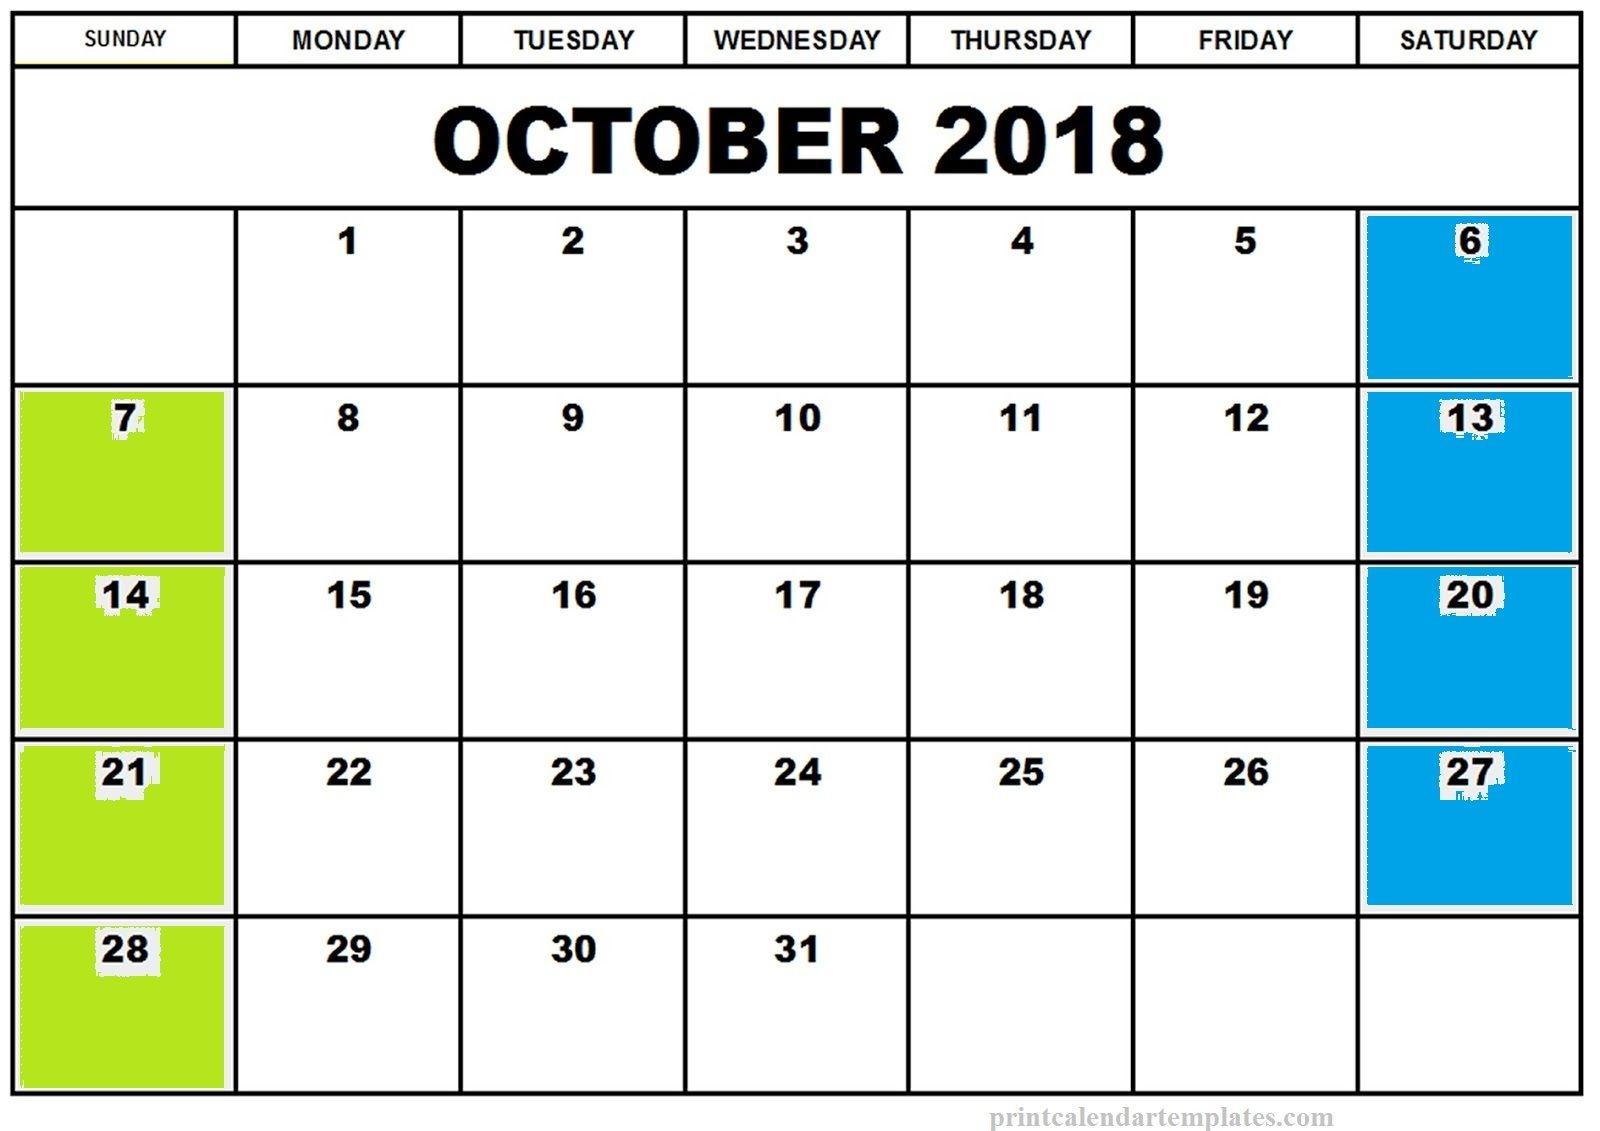 Calendar October 2019 Nsw Printable | Calendar Format Example regarding Calendar October 2019 Nsw Printable